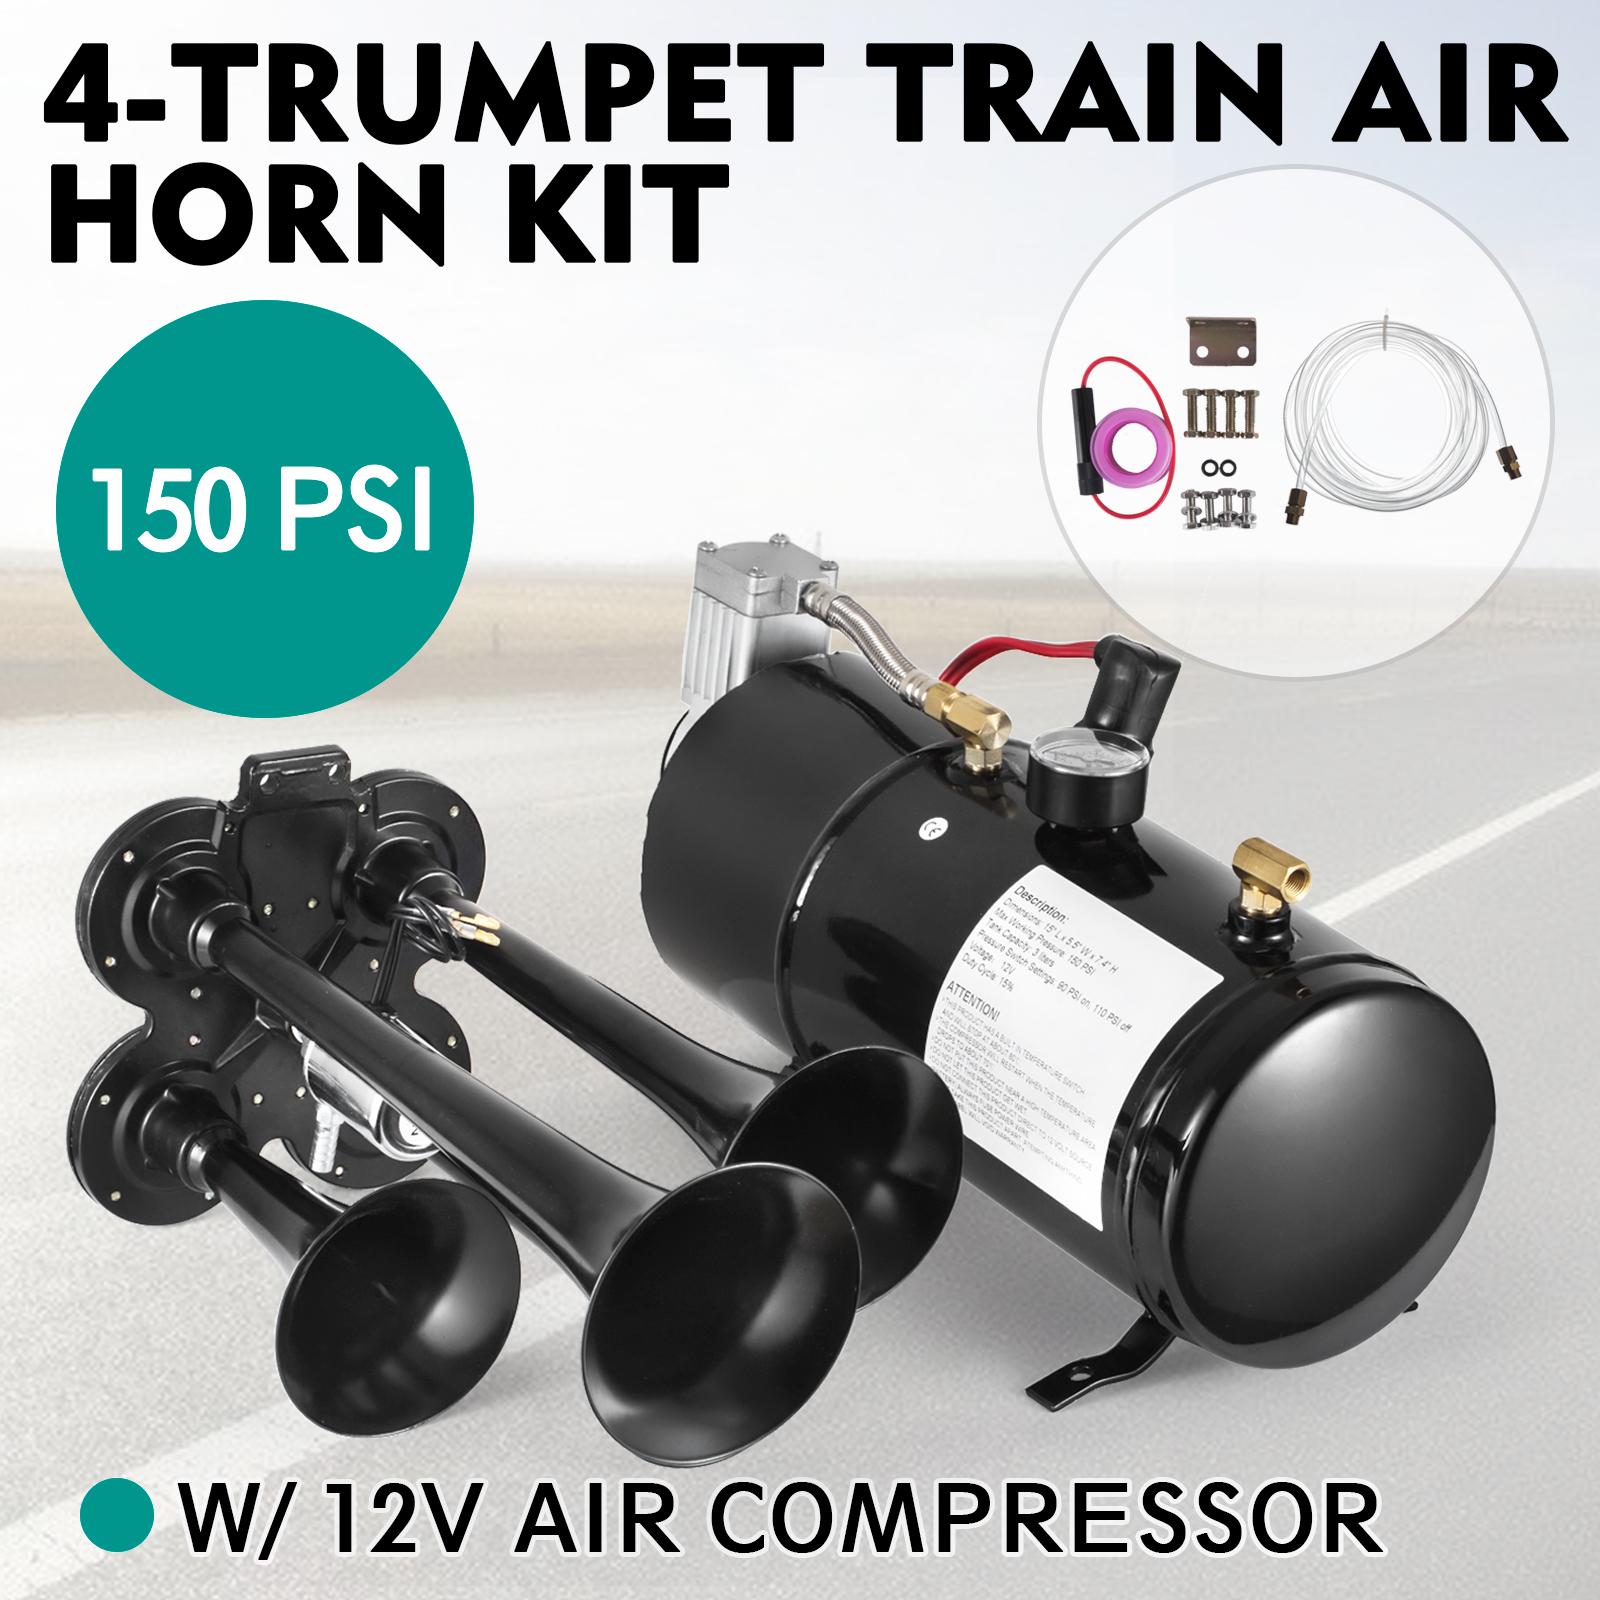 details about air horn 4 trumpet 12 volt compressor 16ft hose 150 db train  150 psi kit truck